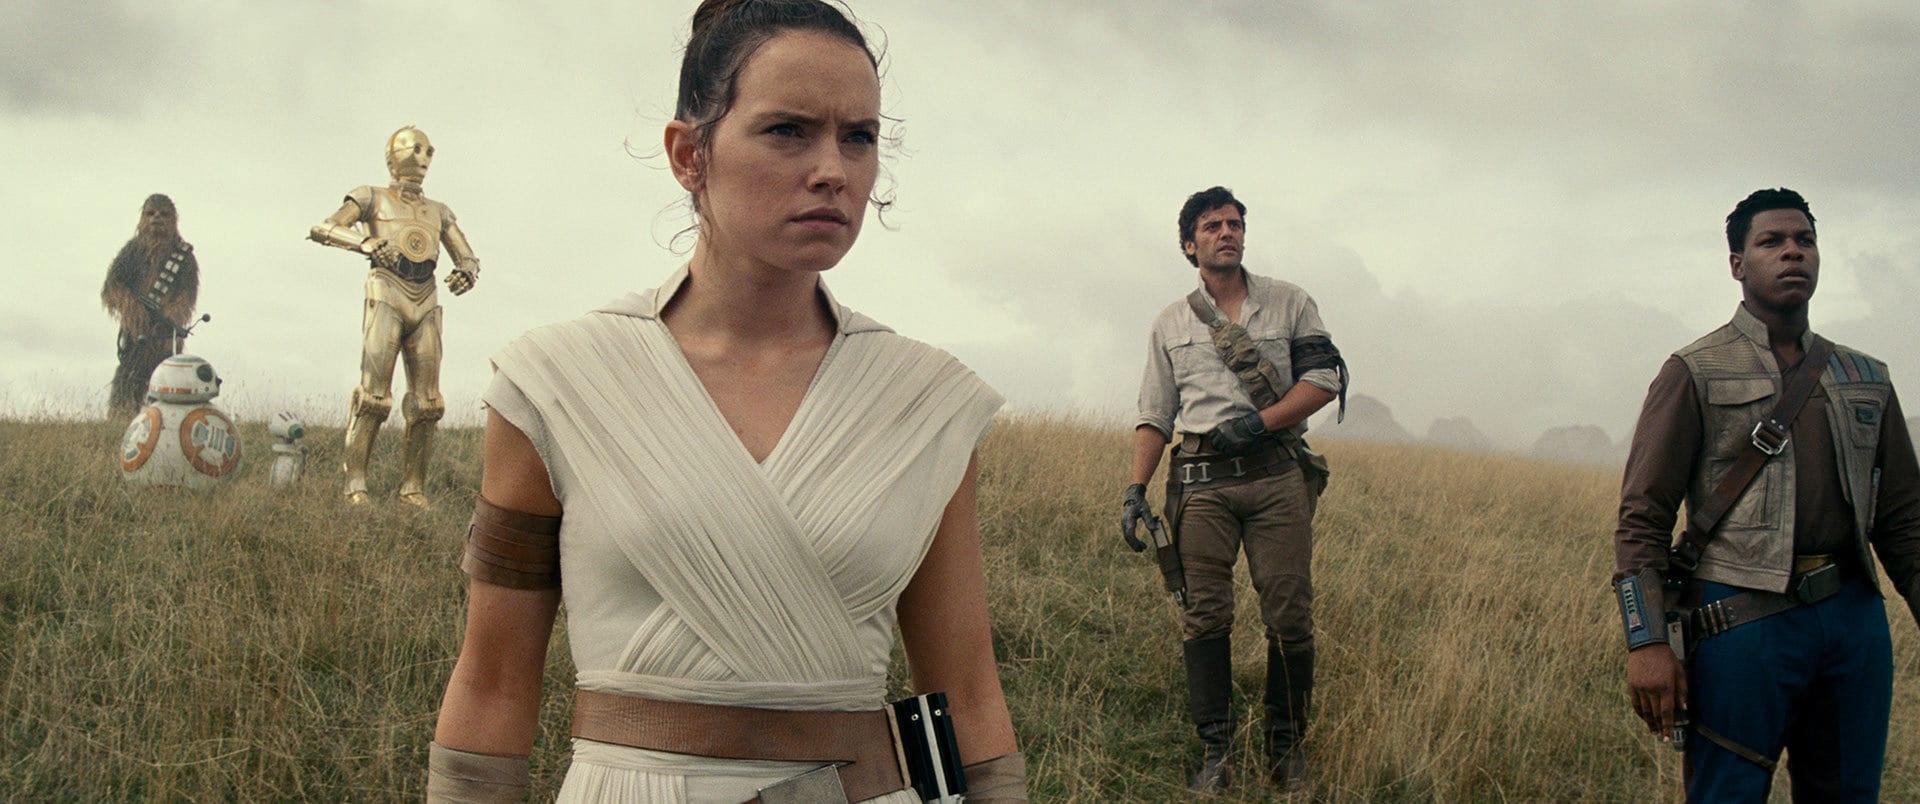 Star-Wars-the-Rise-of-Skywalker-BB8-Chewbacca-C3PO-Ray-Poe-Finn-Film-Kino-Blogbericht